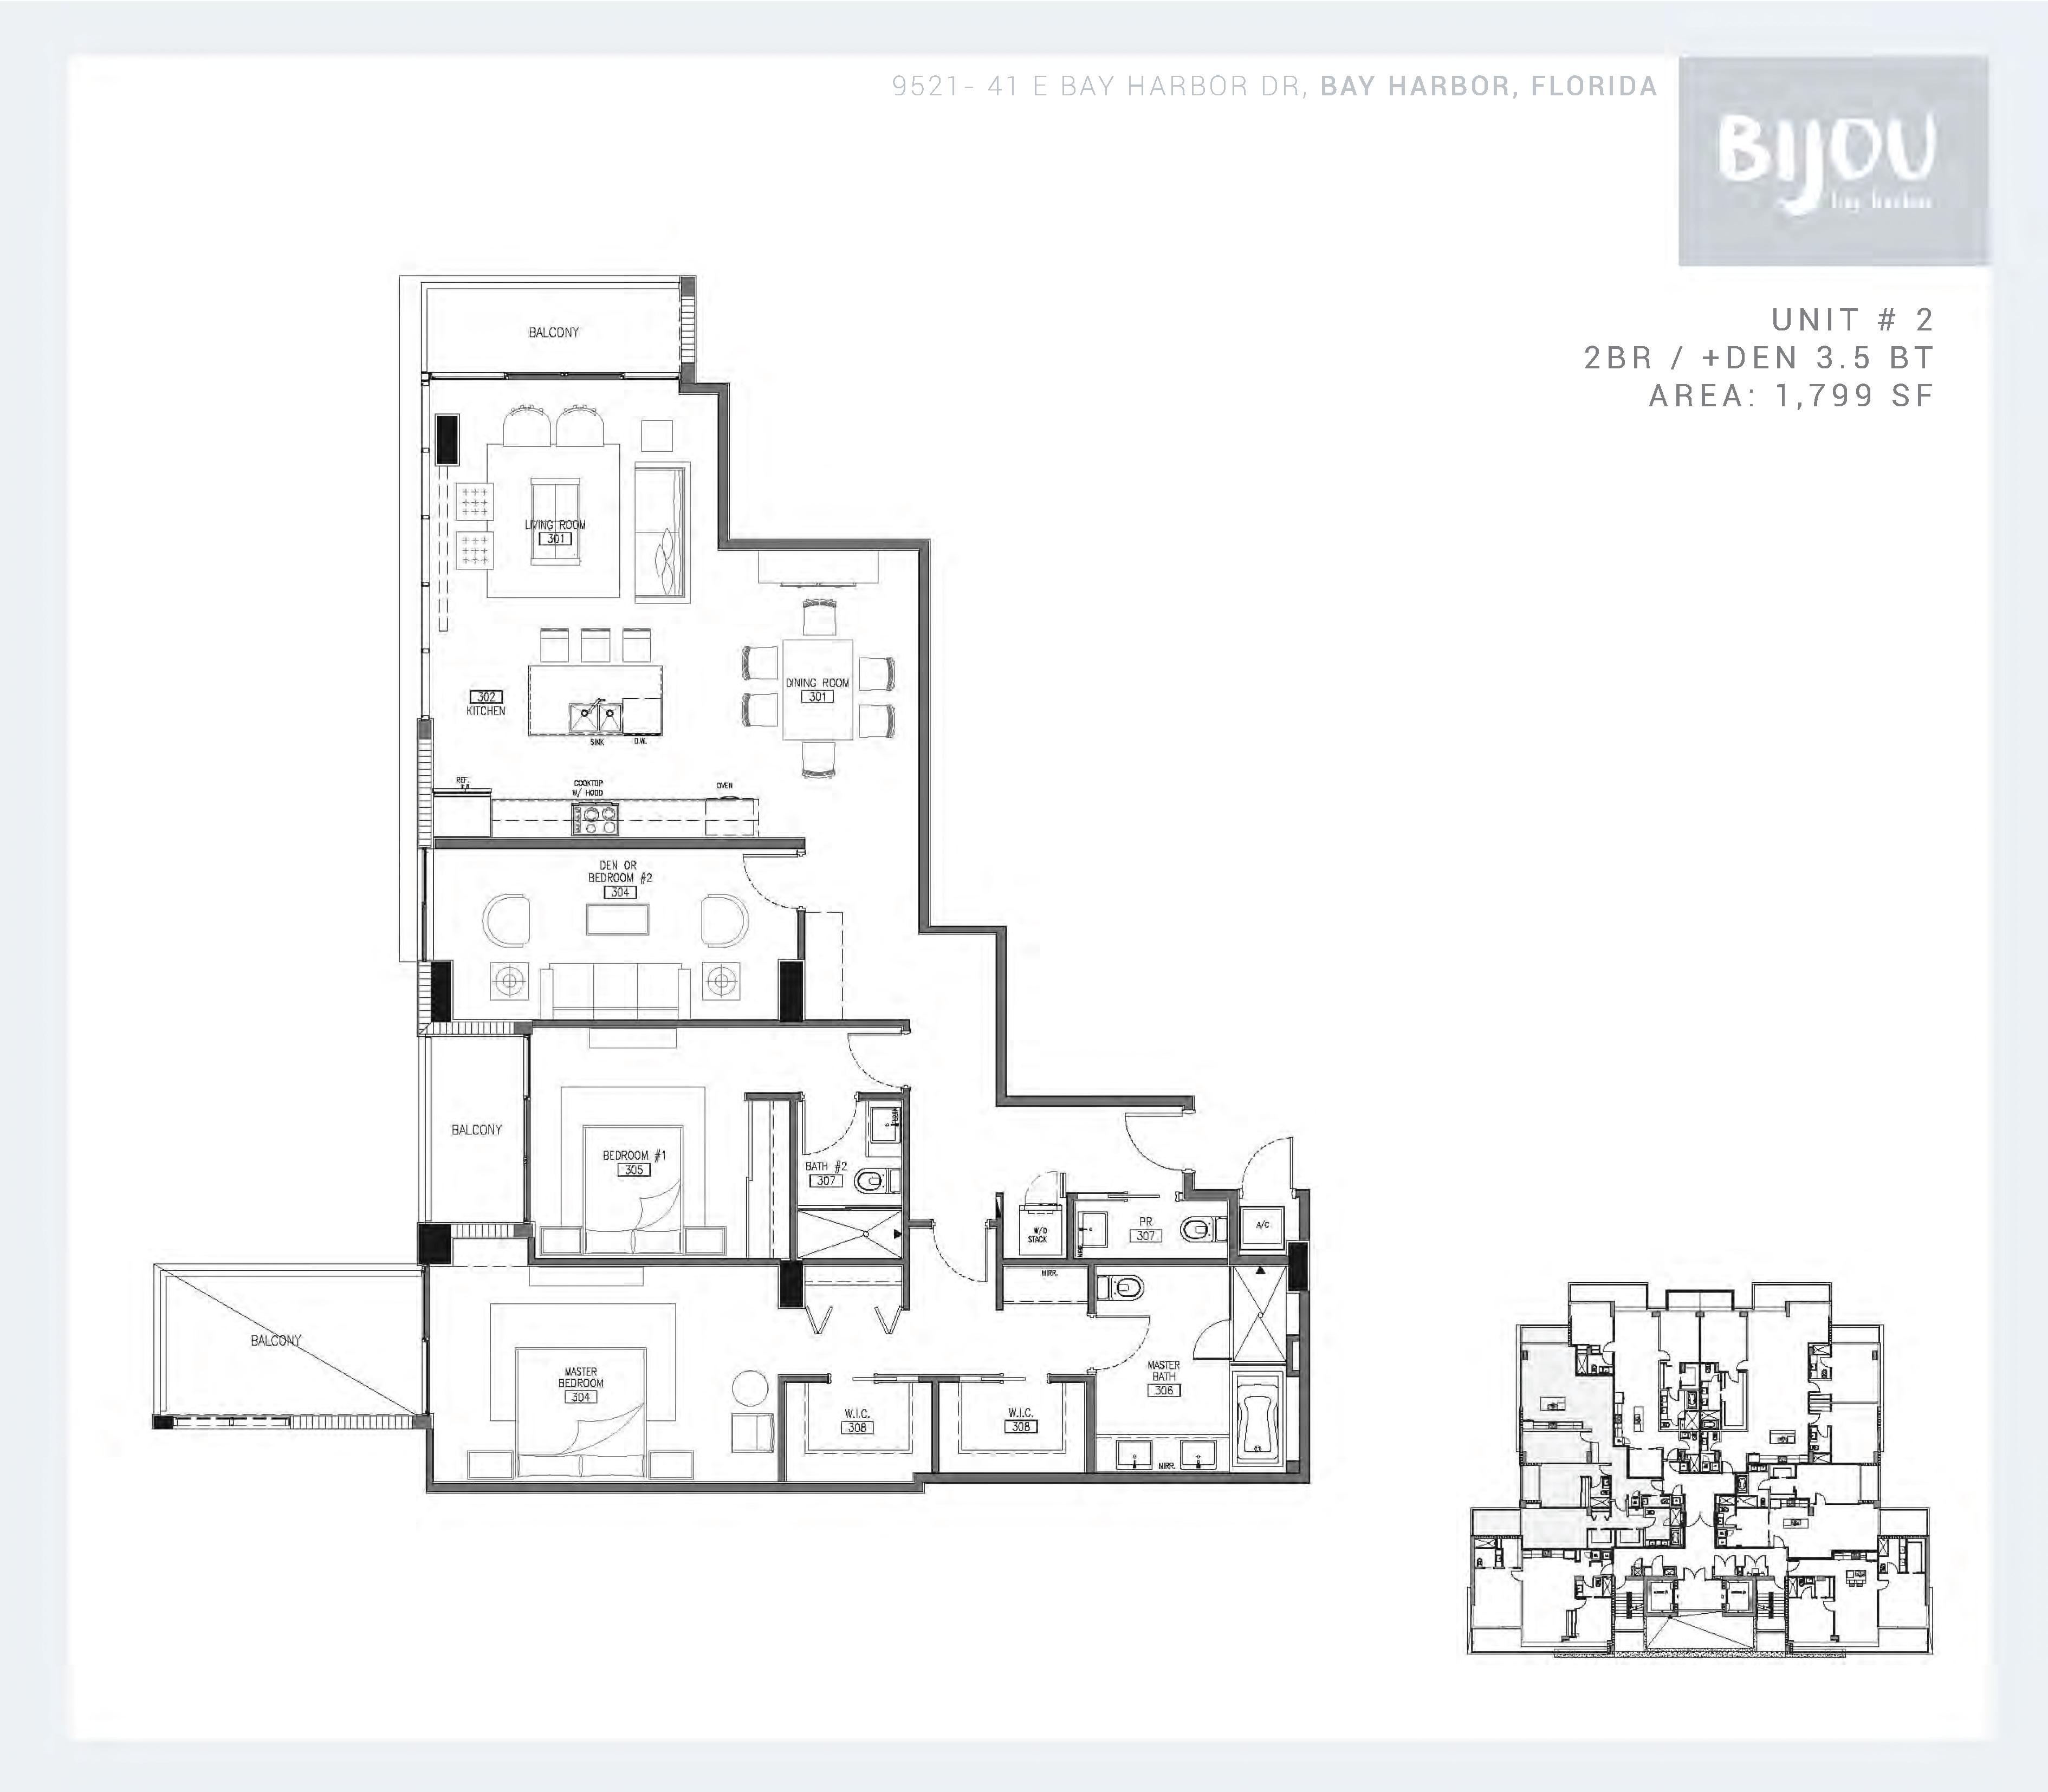 Bijou Bay Harbor Condos For Sale Rent Floor Plans